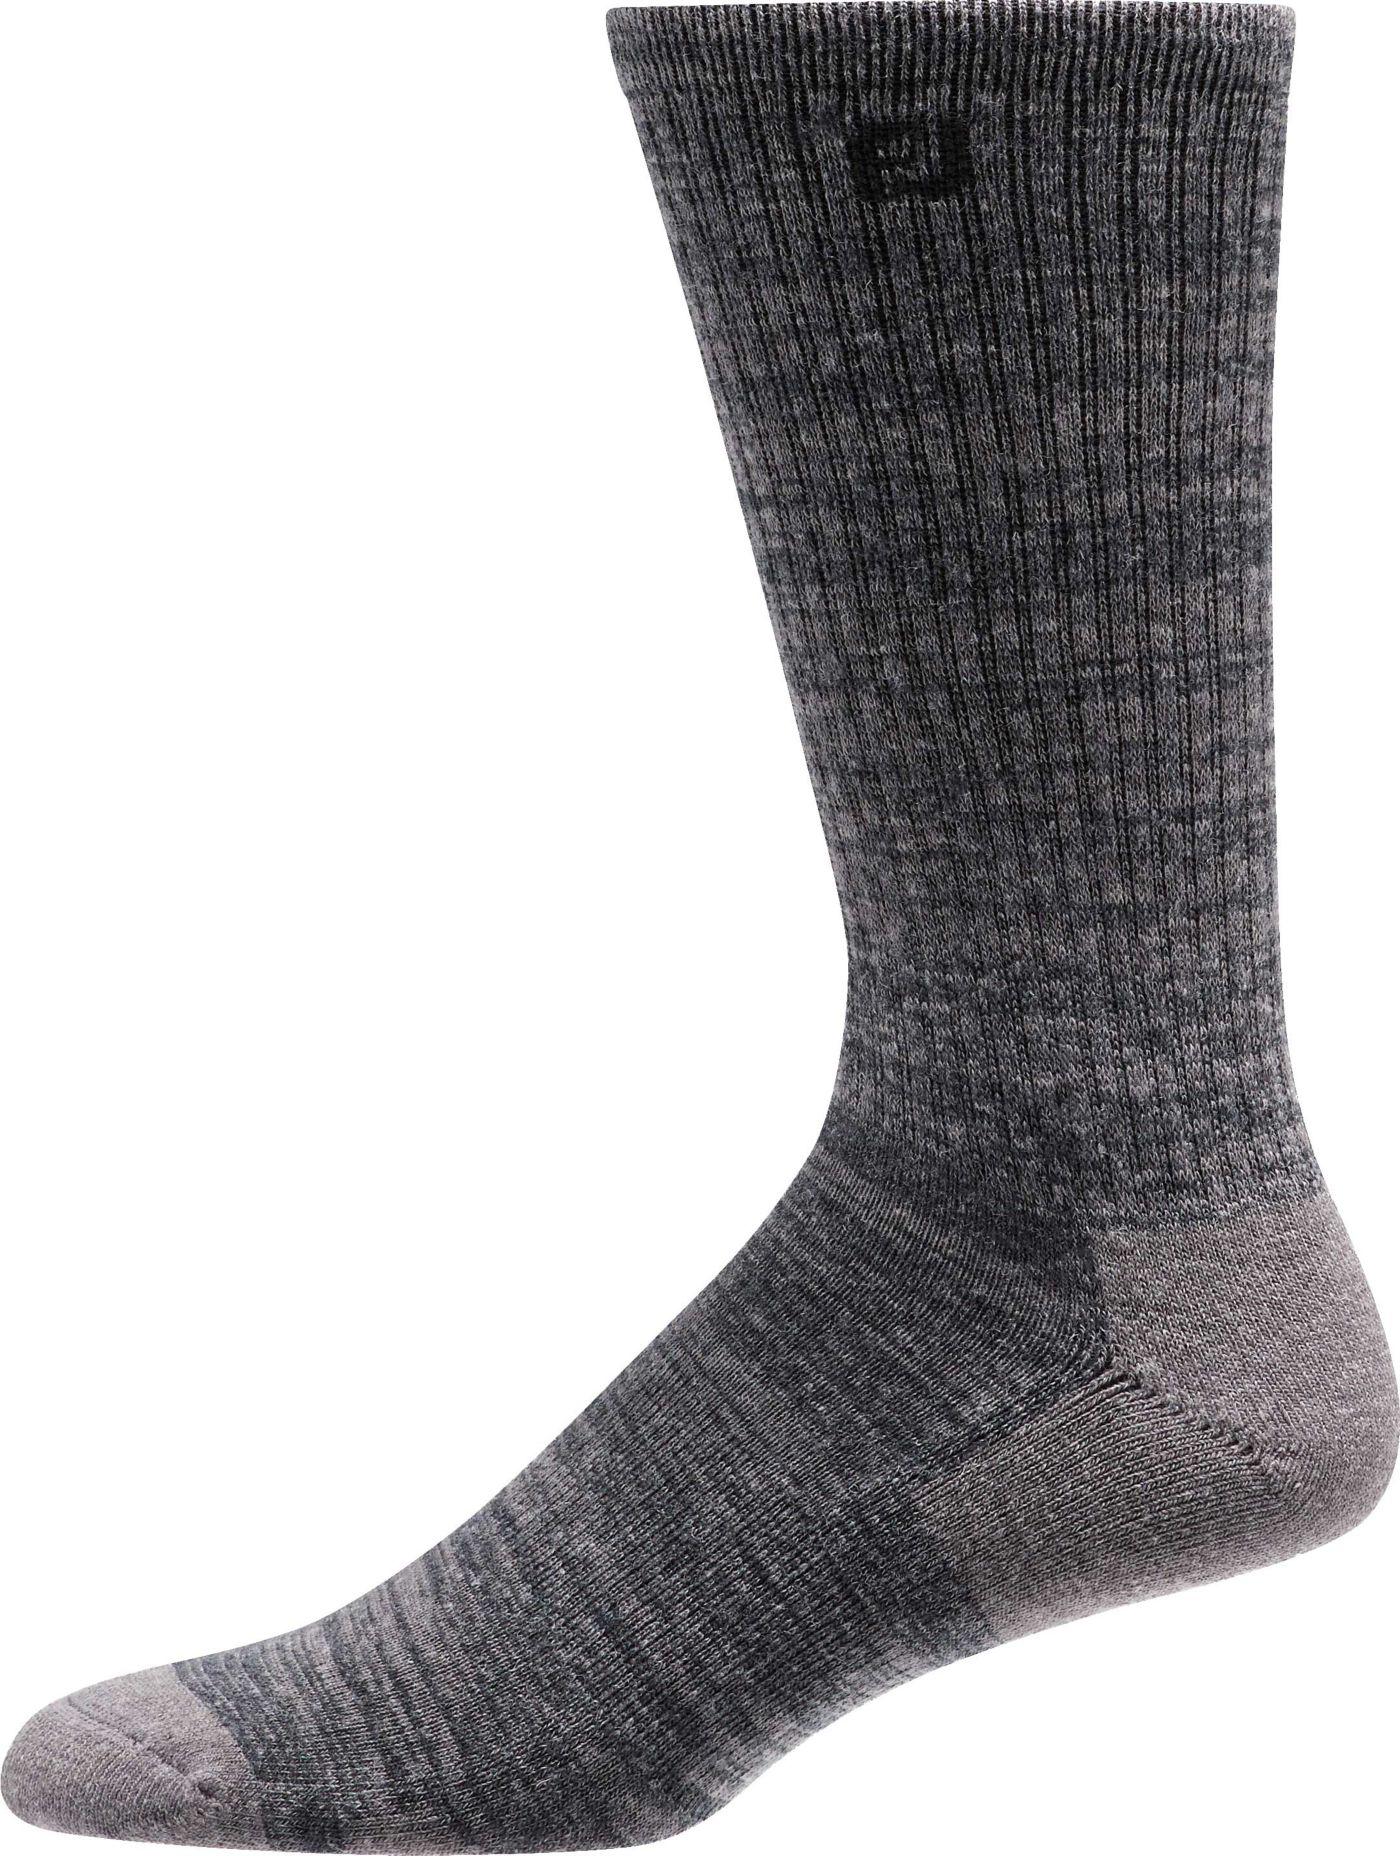 FootJoy Men's TechSof Tour Thermal Crew Golf Socks